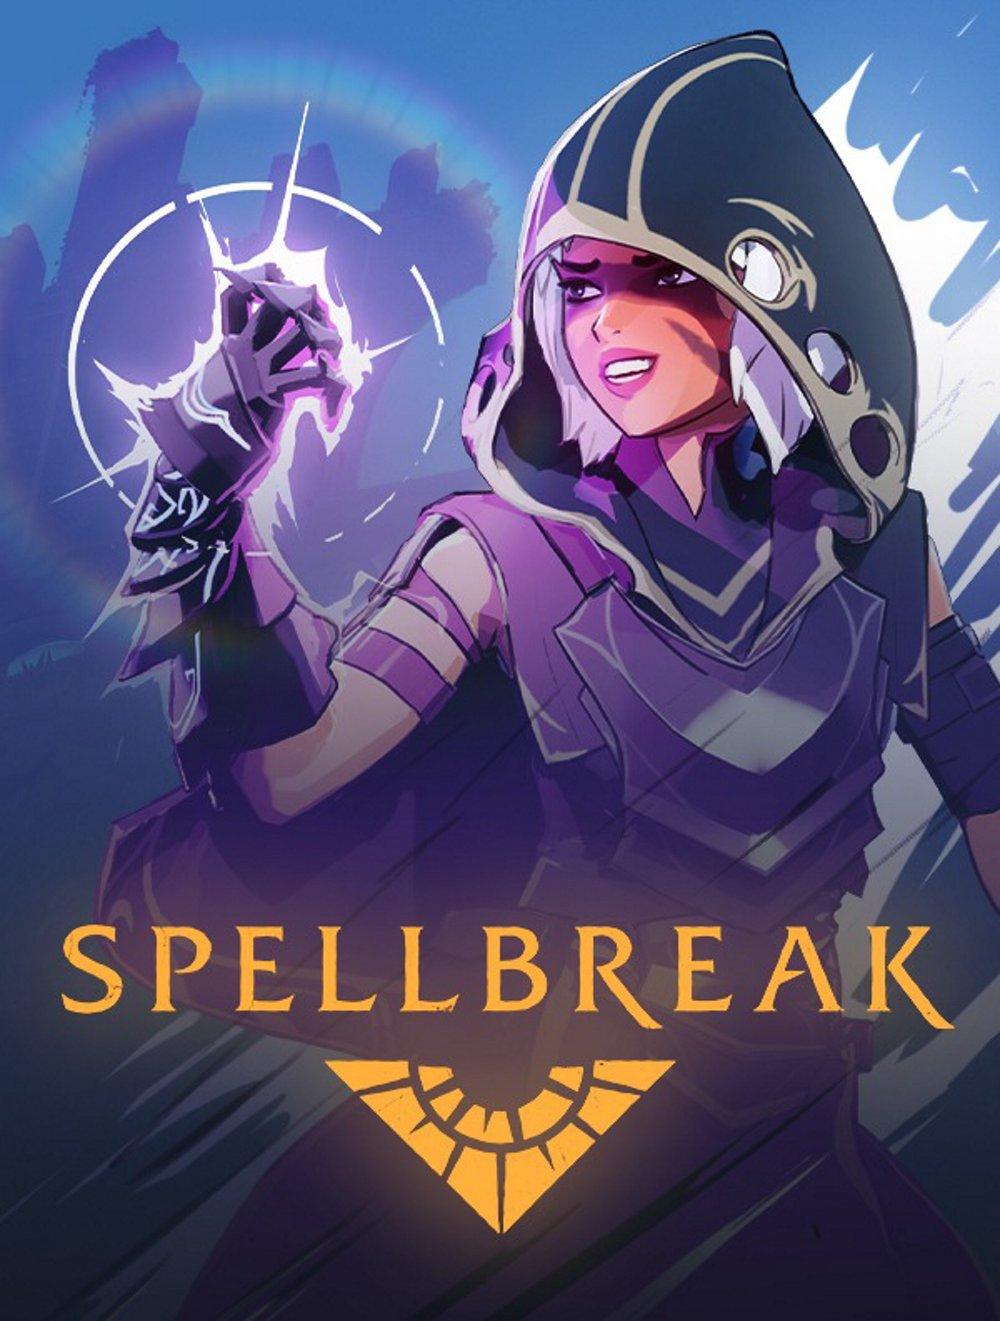 EPIC GAMES: Spellbreak (Llaves gratis)